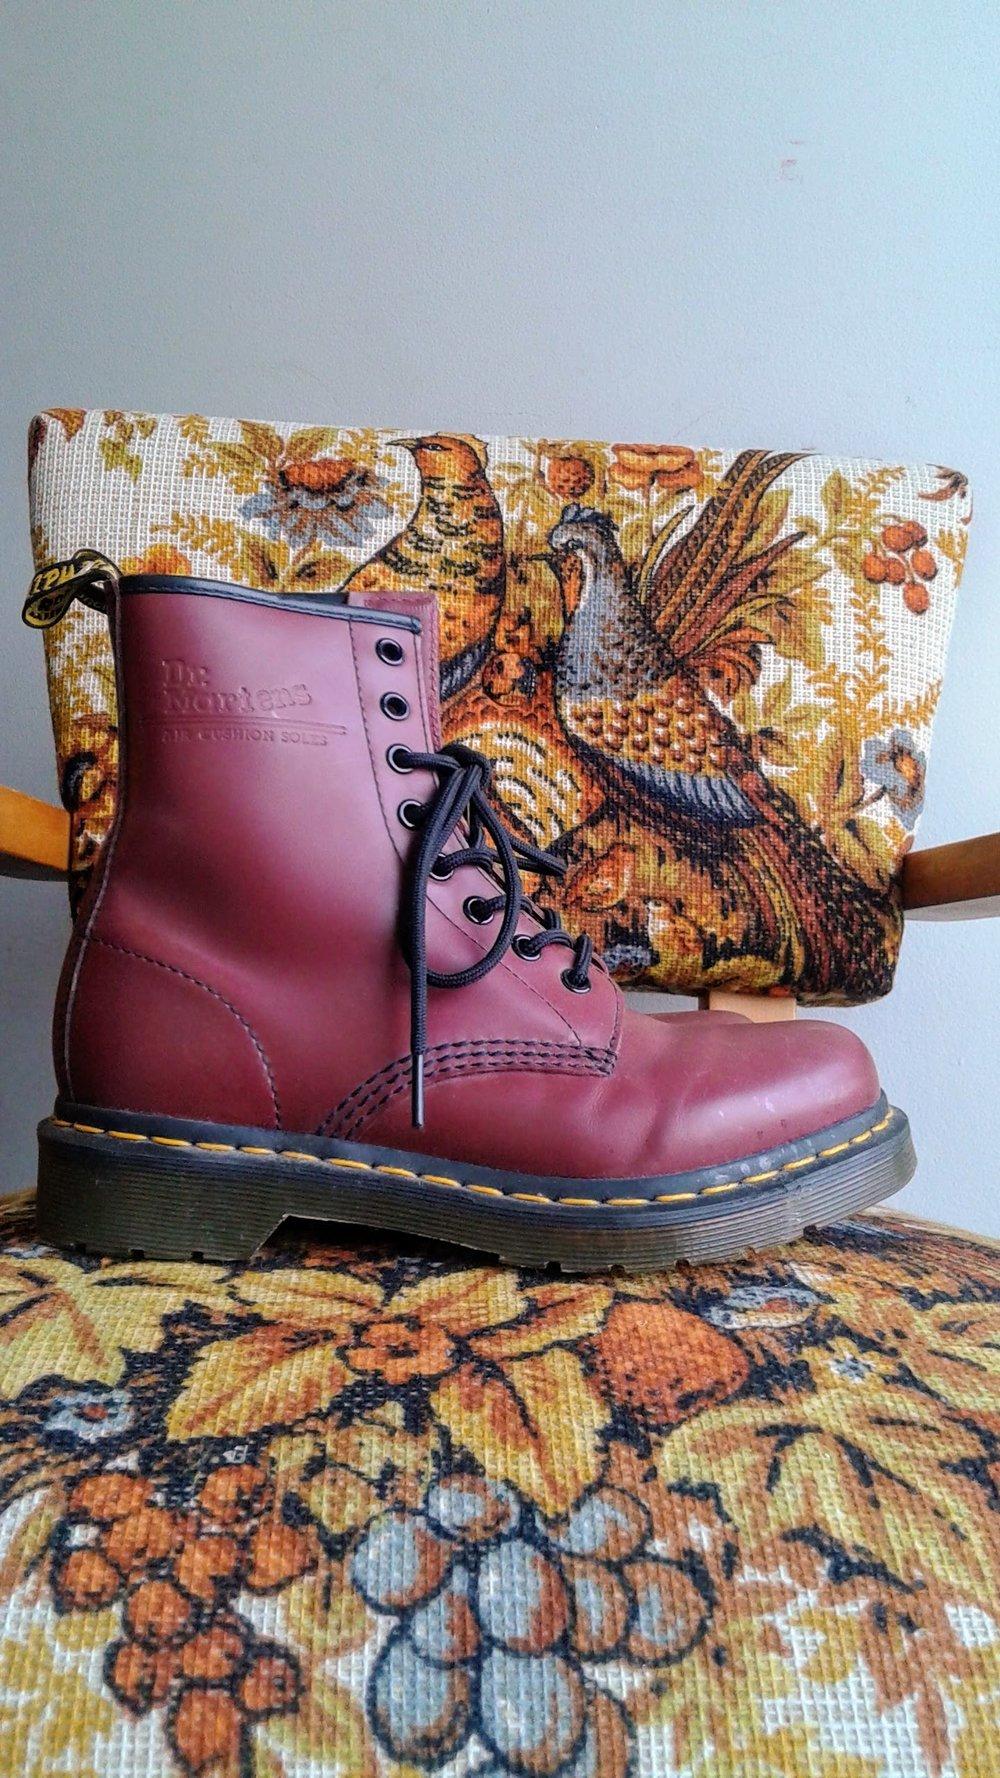 Dr Martens boots; S6.5, $95